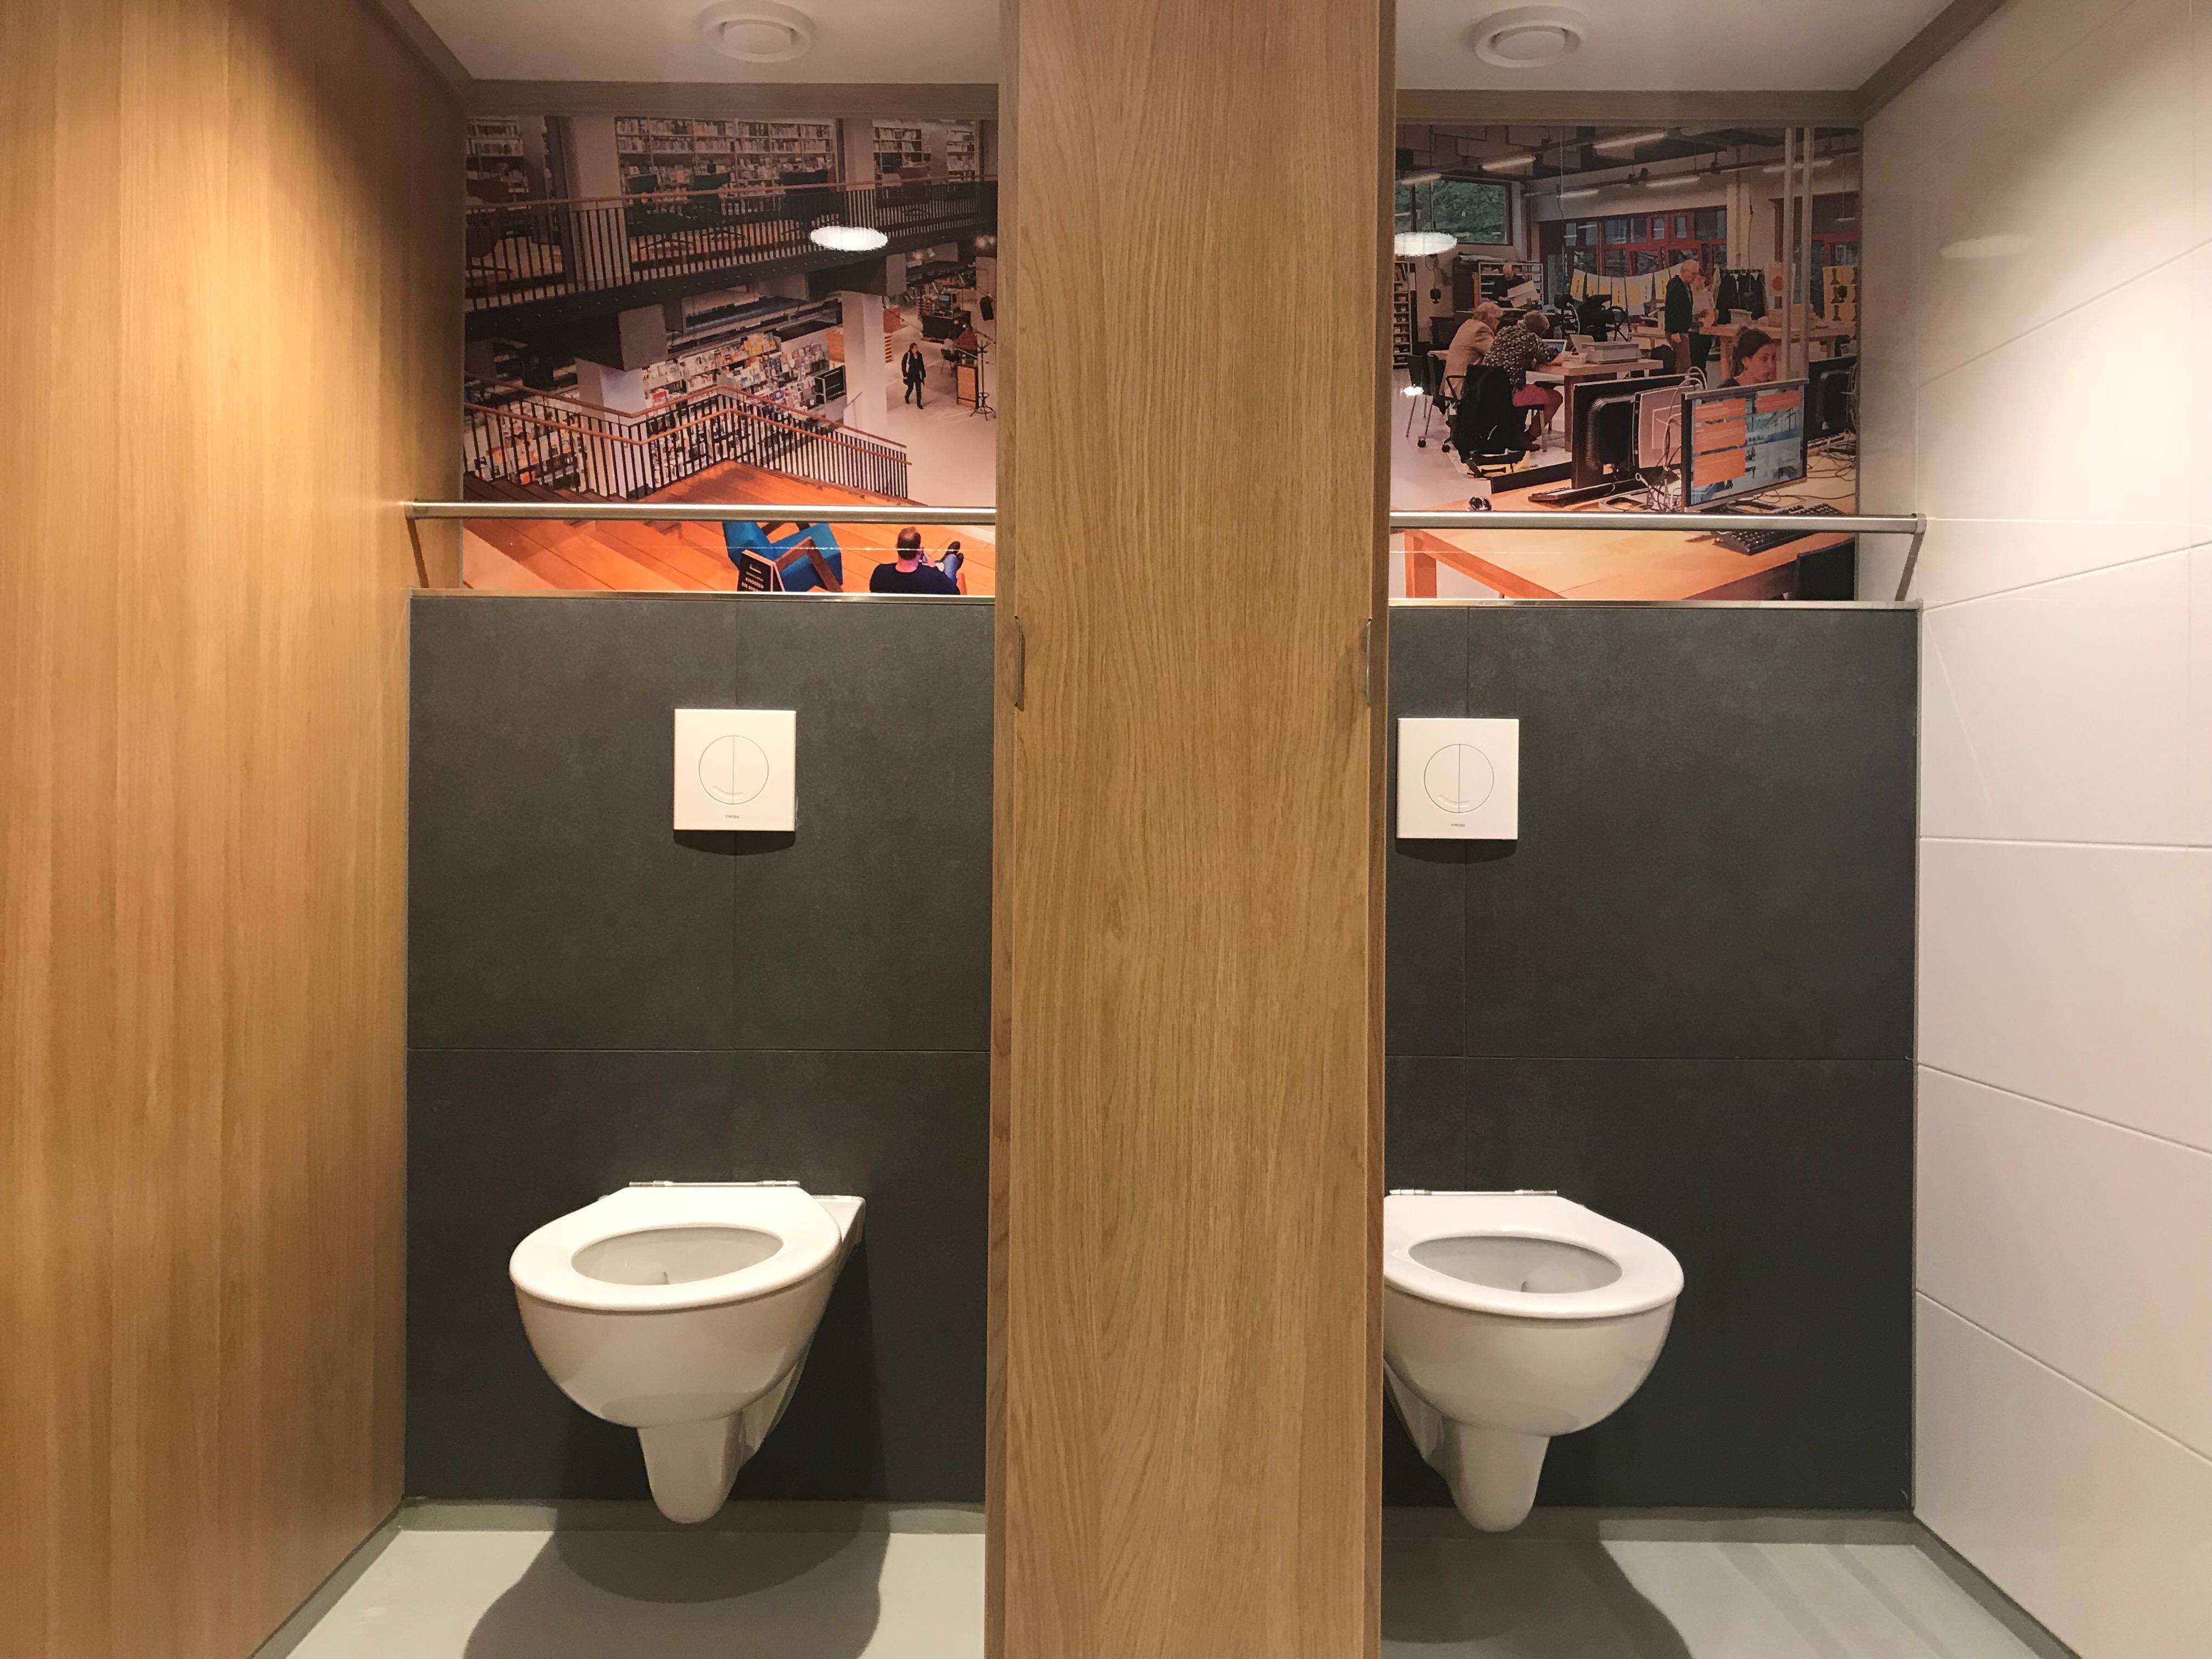 Toletto - Publieke toiletten Chocoladefabriek Gouda 2